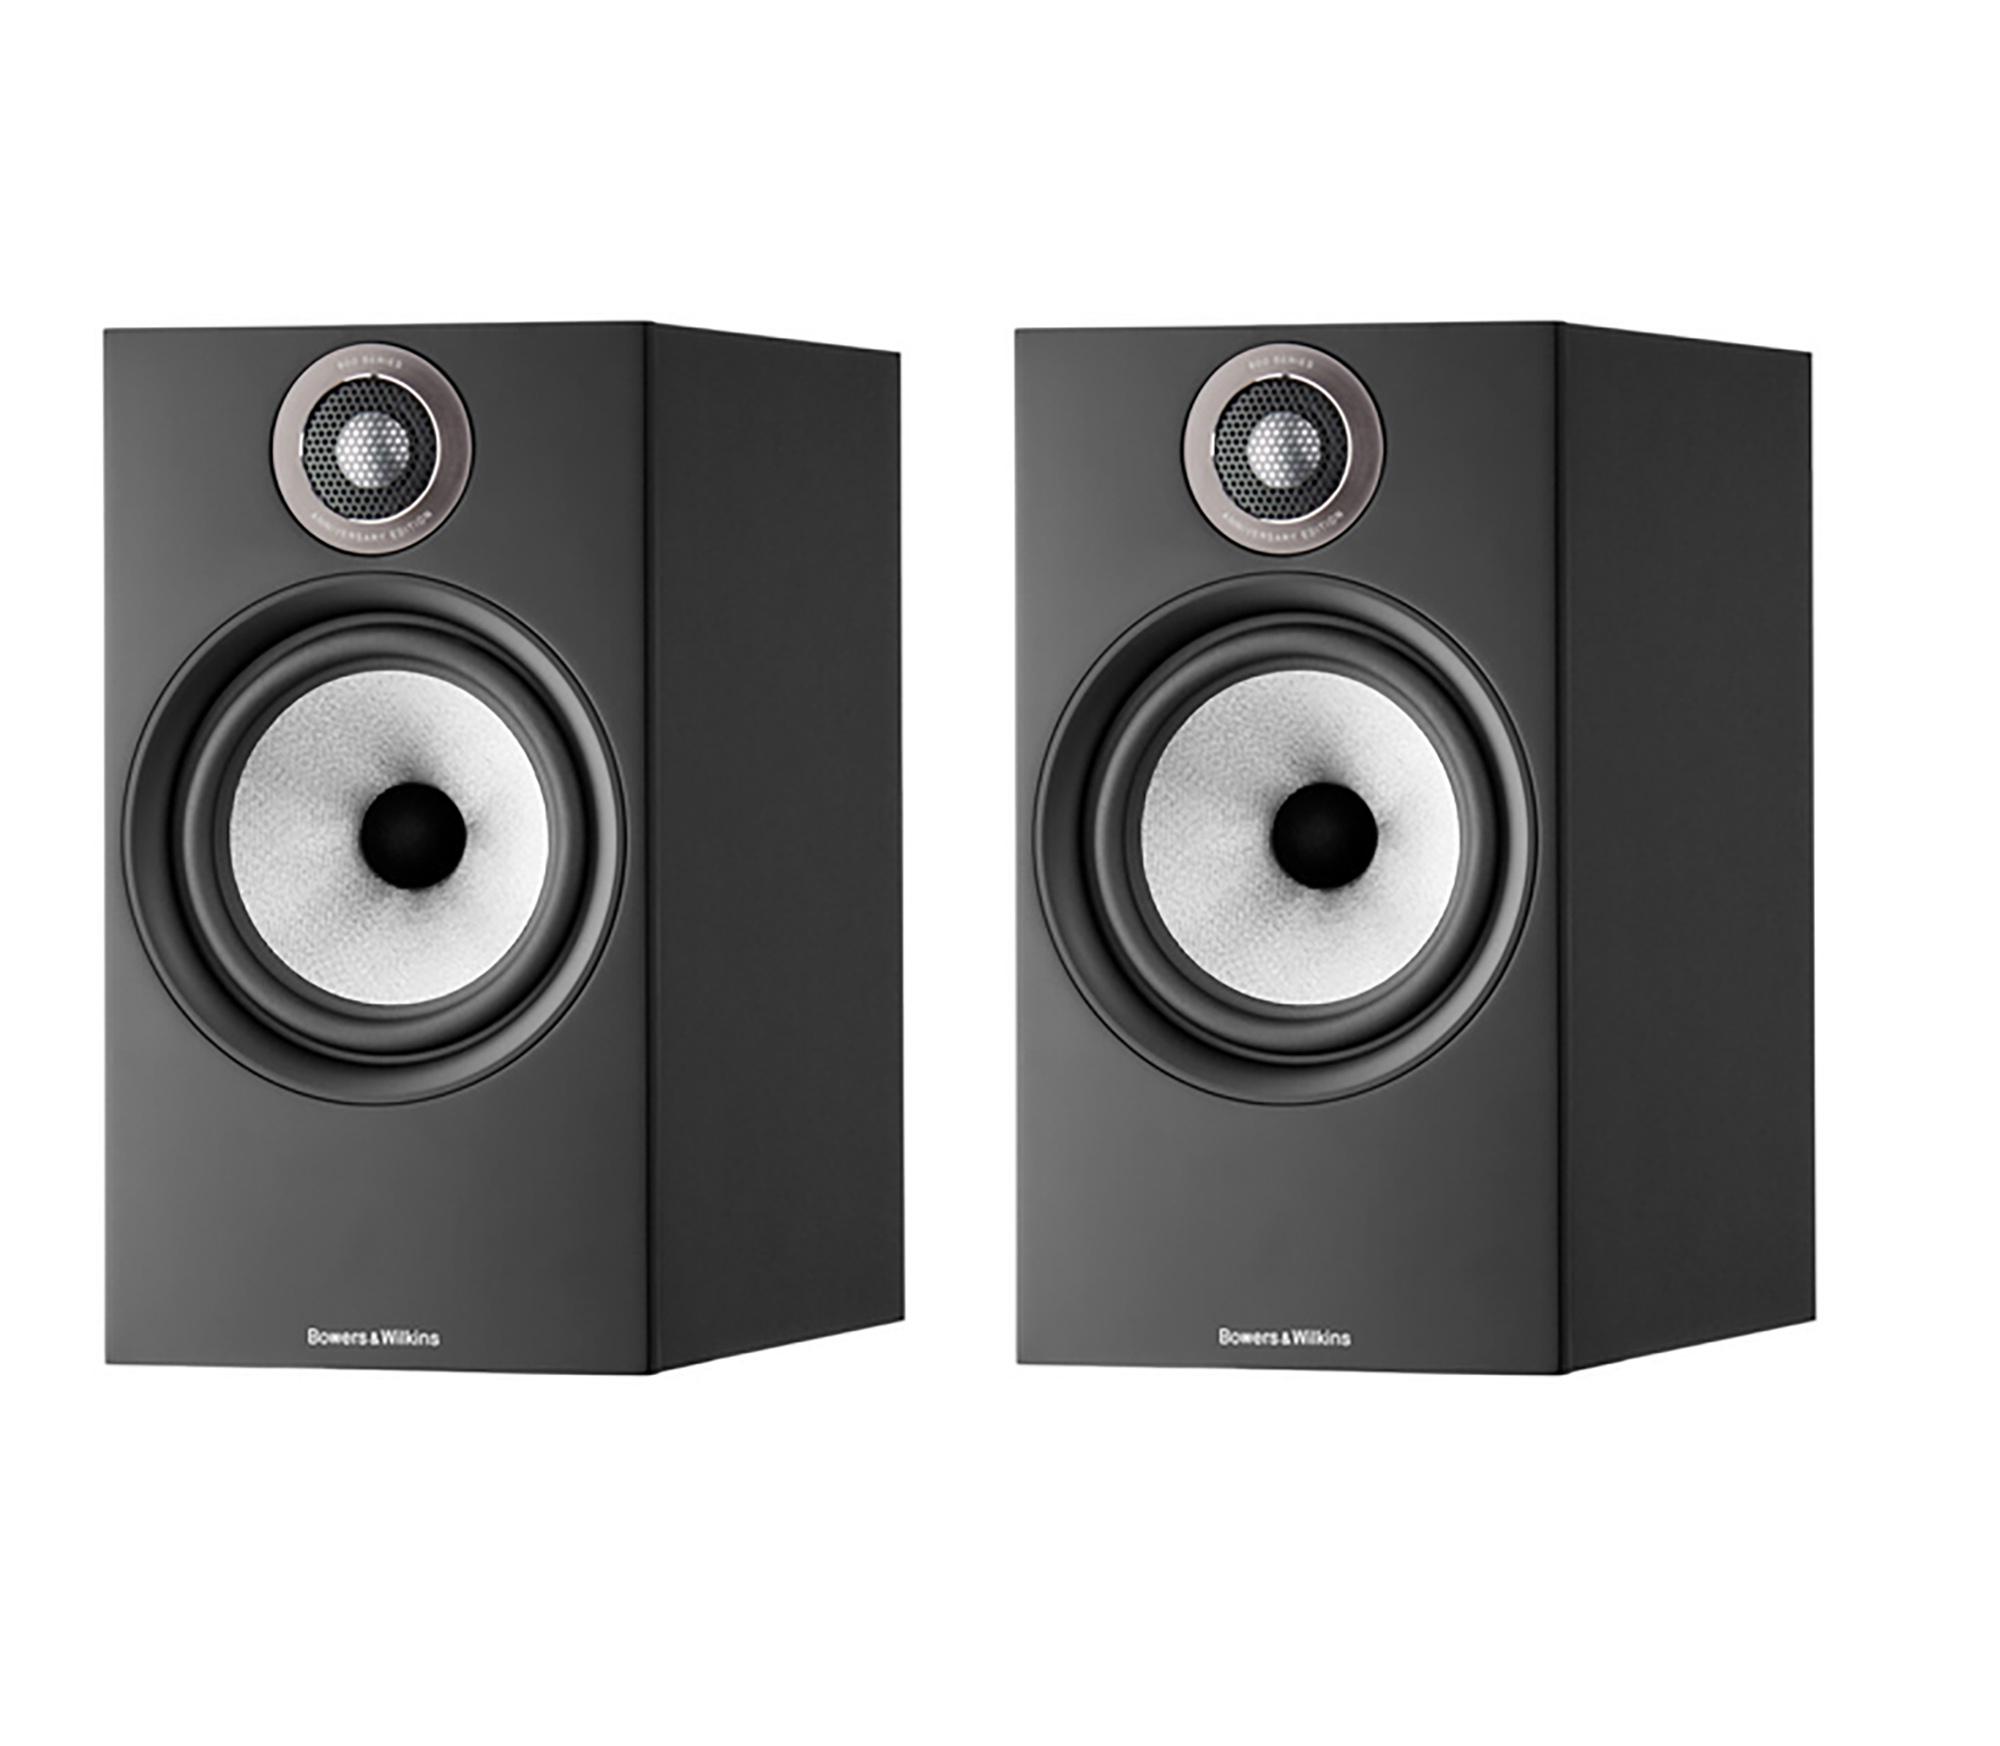 Bowers & Wilkins Caixa Torre 606 S2 Anniversary Edition (Gloss Black) Par - Sem Estante